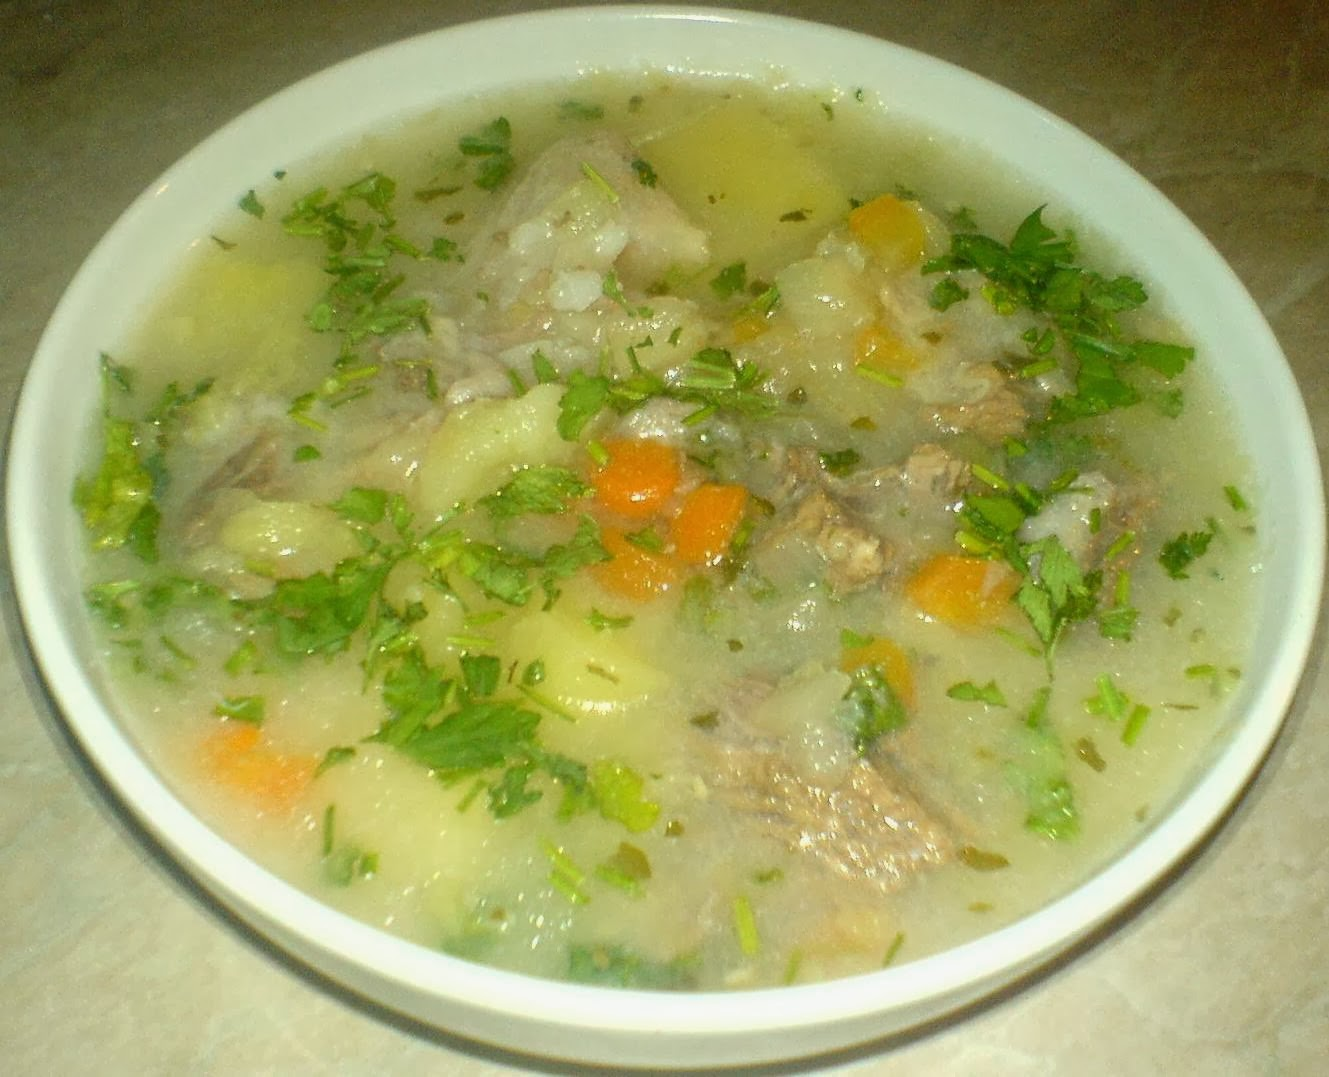 reteta de ciorba, retete culinare, mancare, preparate culinare, retete cu vita, carne de manzat, ciorba de vacuta cu bors acru, ciorba de vacuta, retete si preparate culinare cu carne de vacuta,